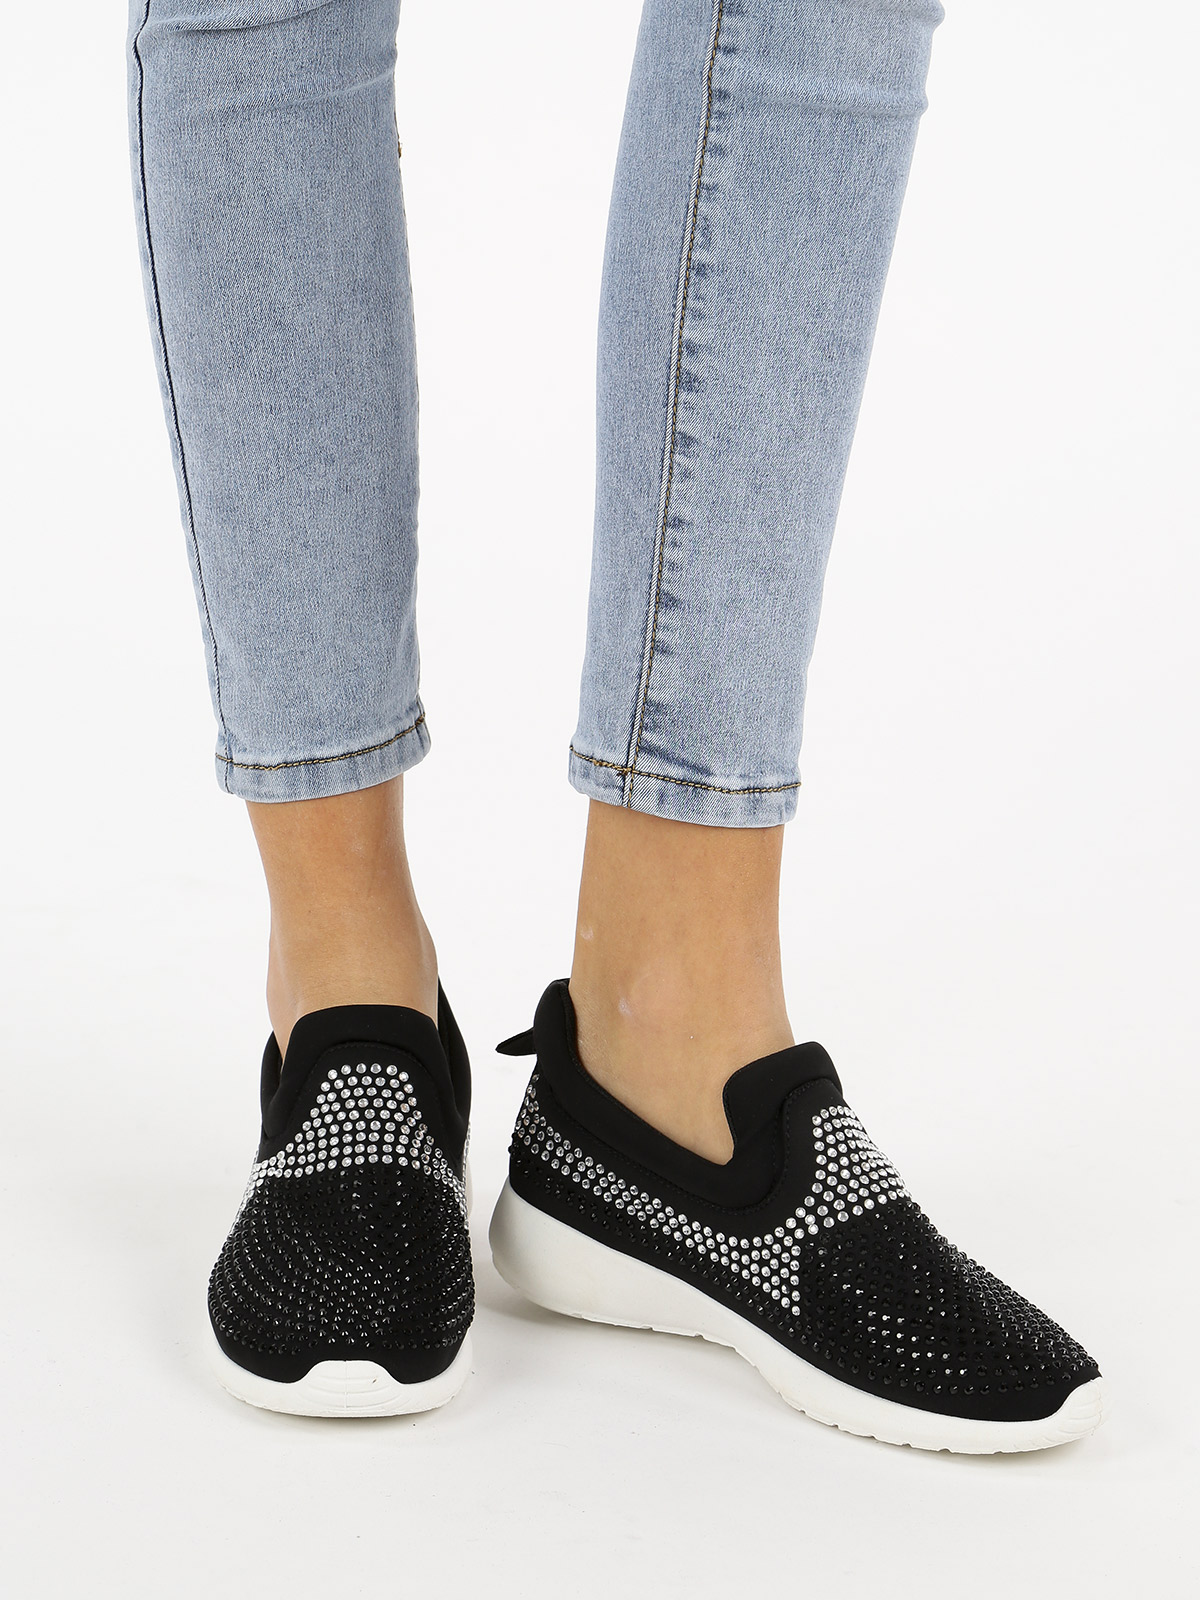 SOLADA Sneakers With Rhinestone